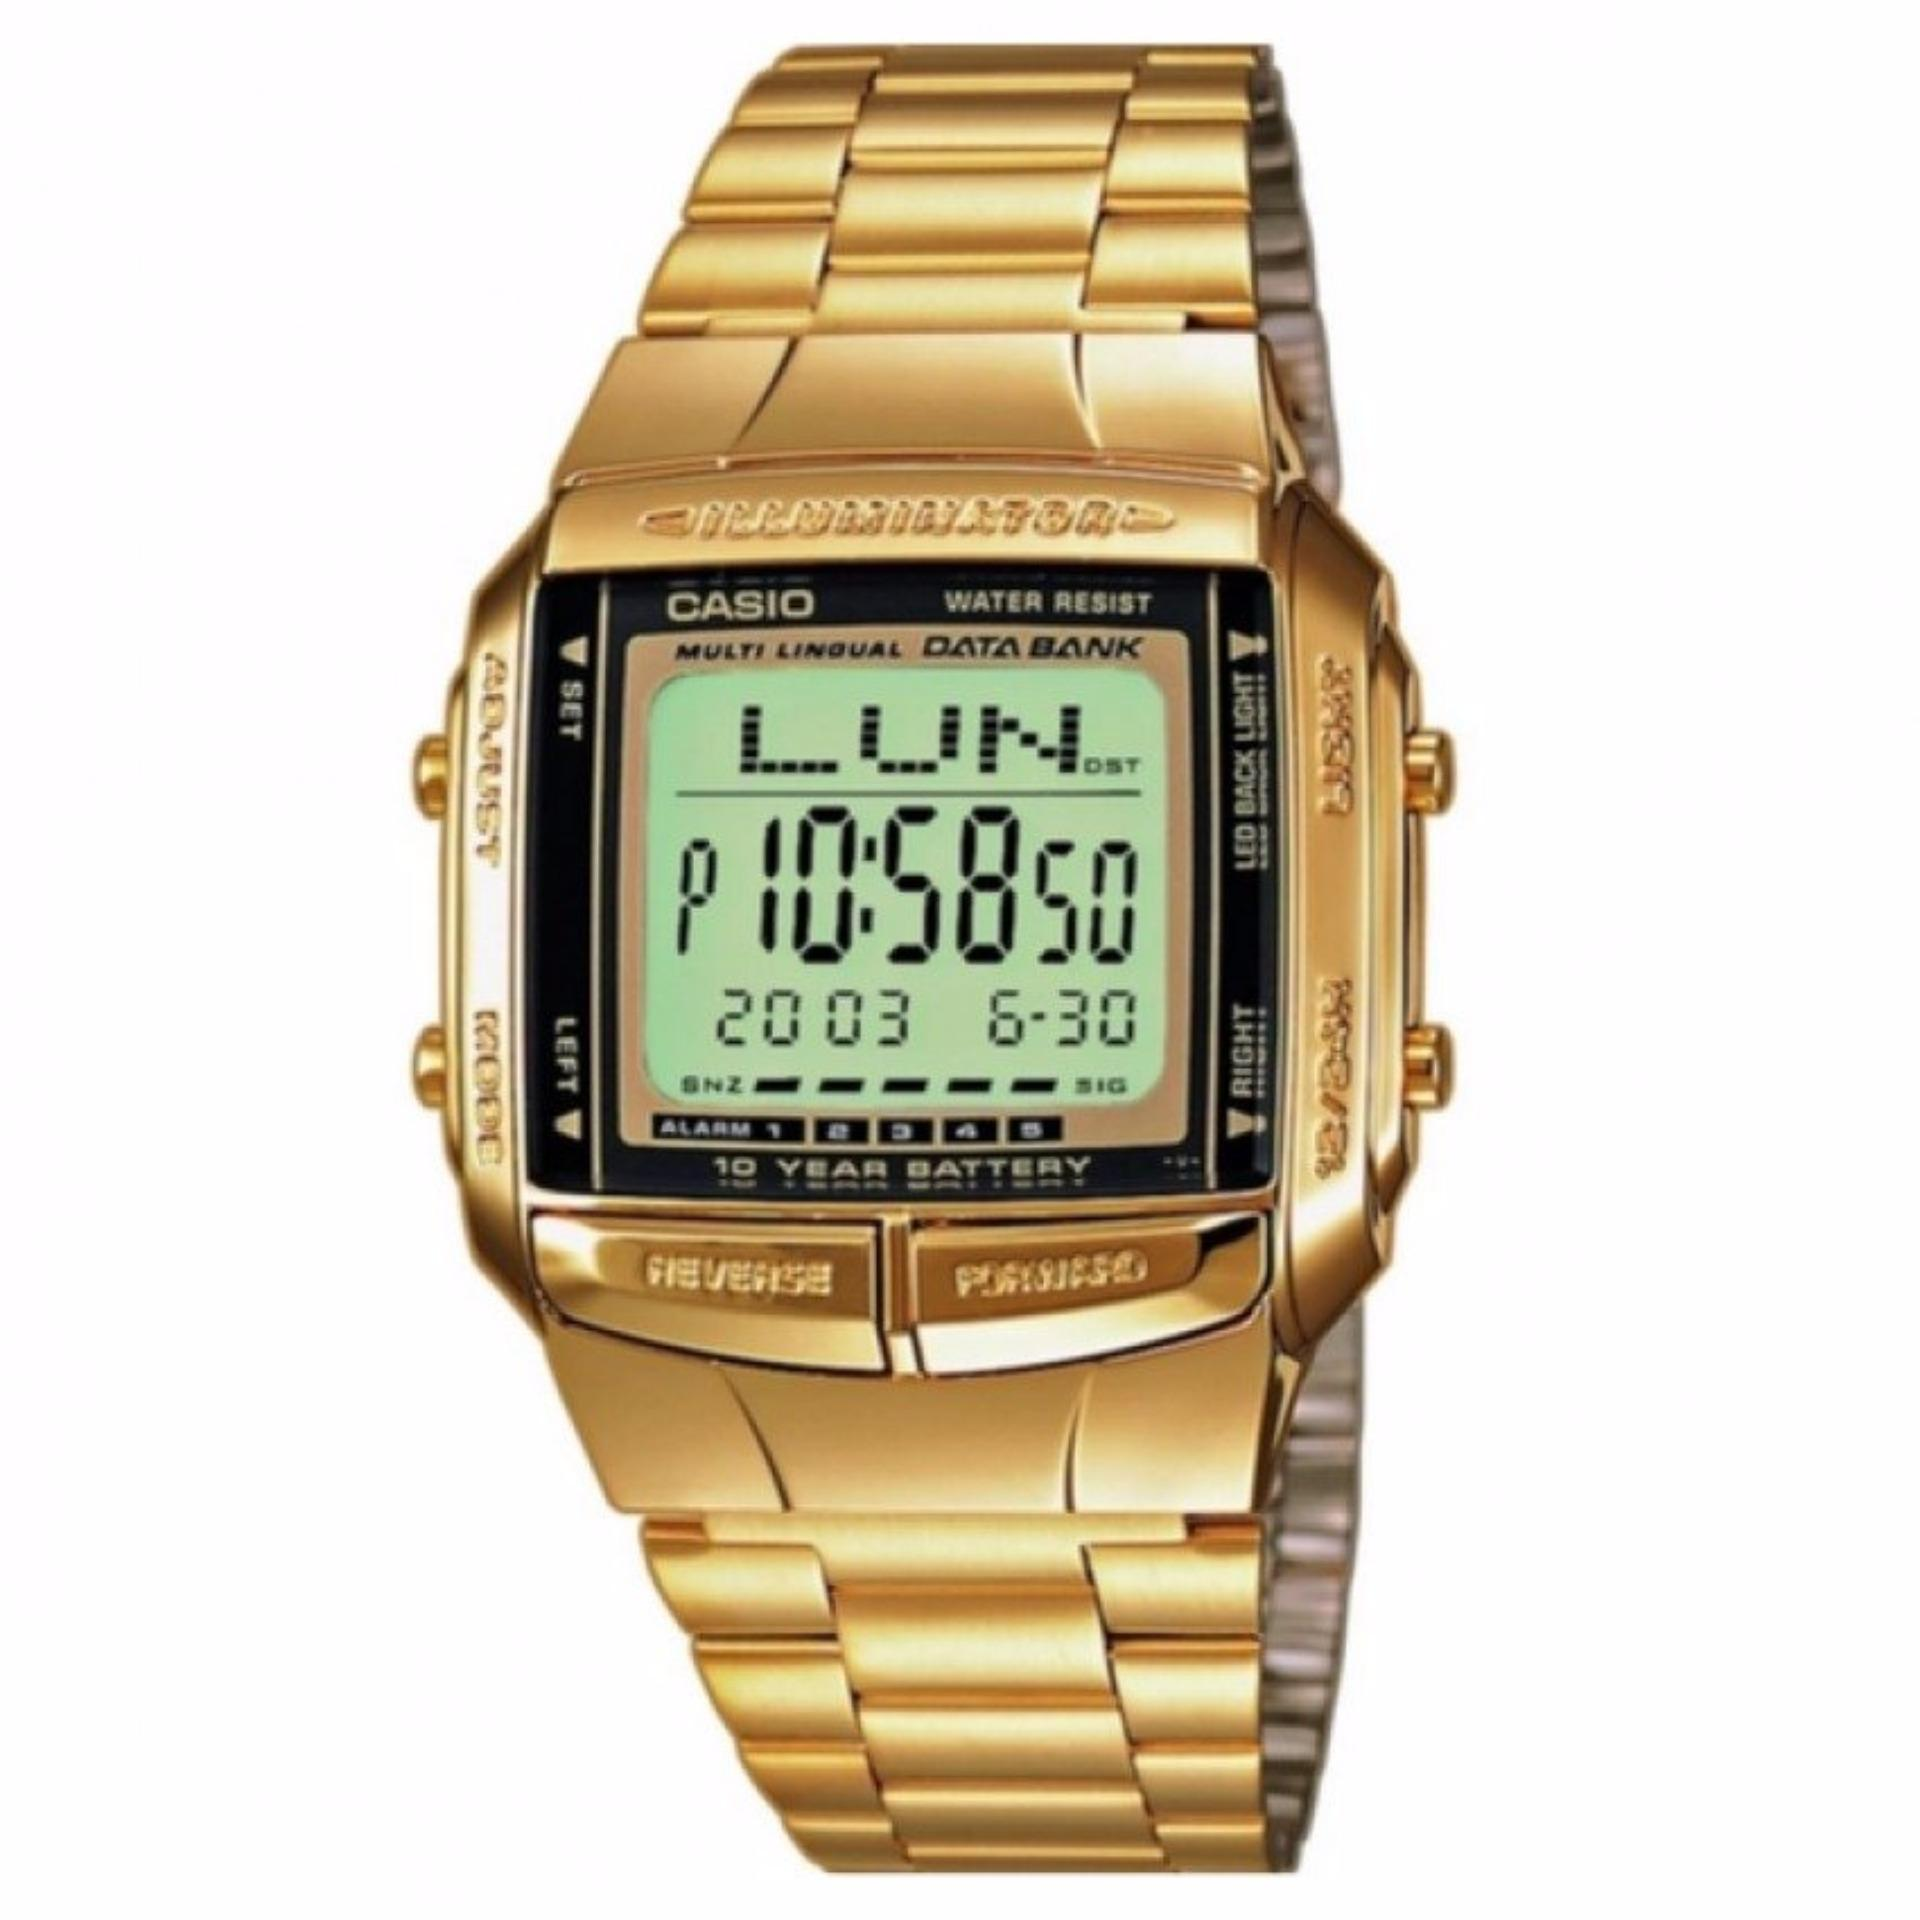 Pencarian Termurah Casio Db 360g 9adf Jam Tangan Unisex Gold Original Digitec Stainless Steel